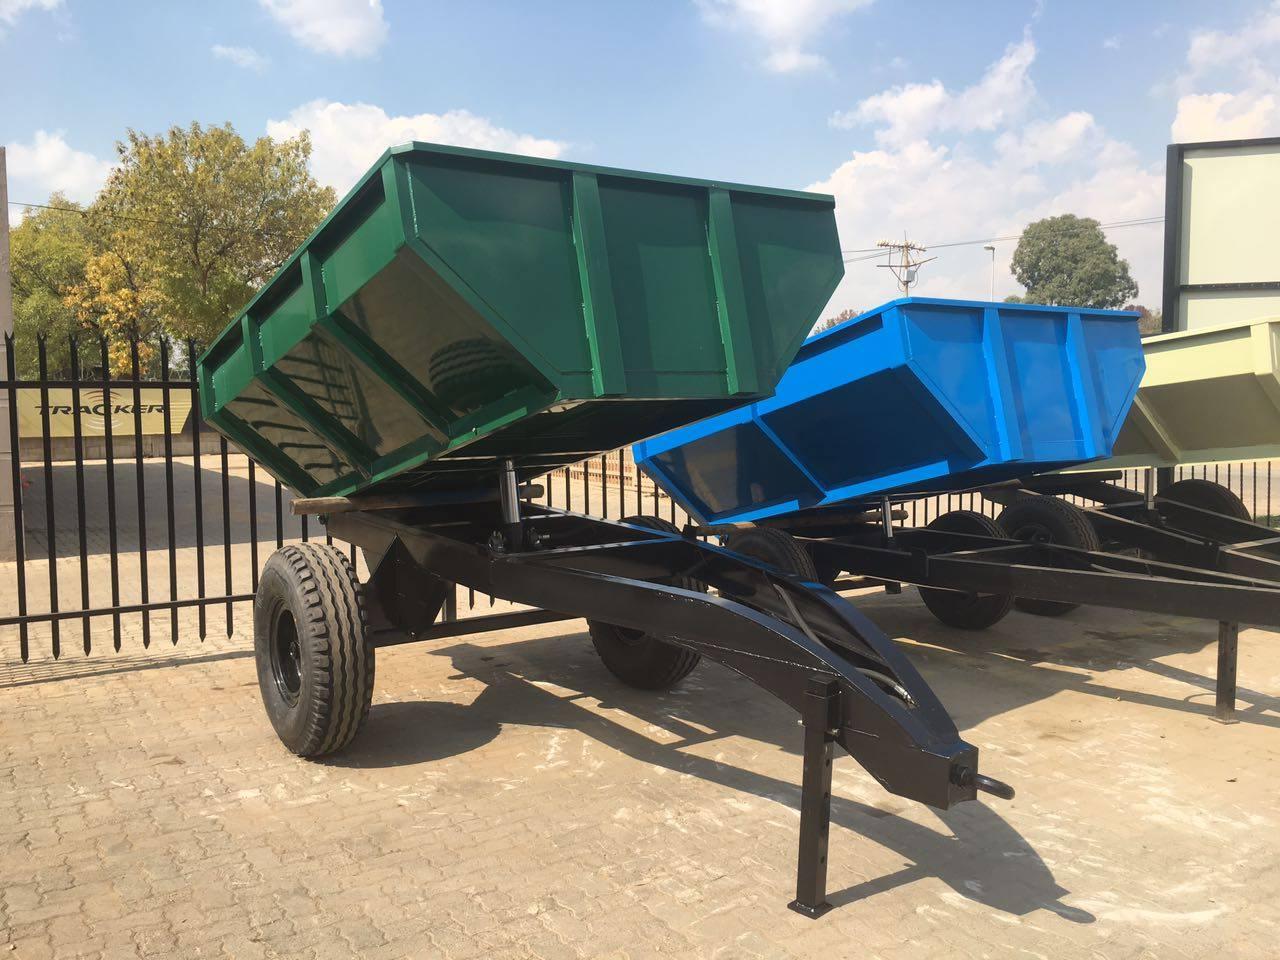 Slashers and farming equipment new